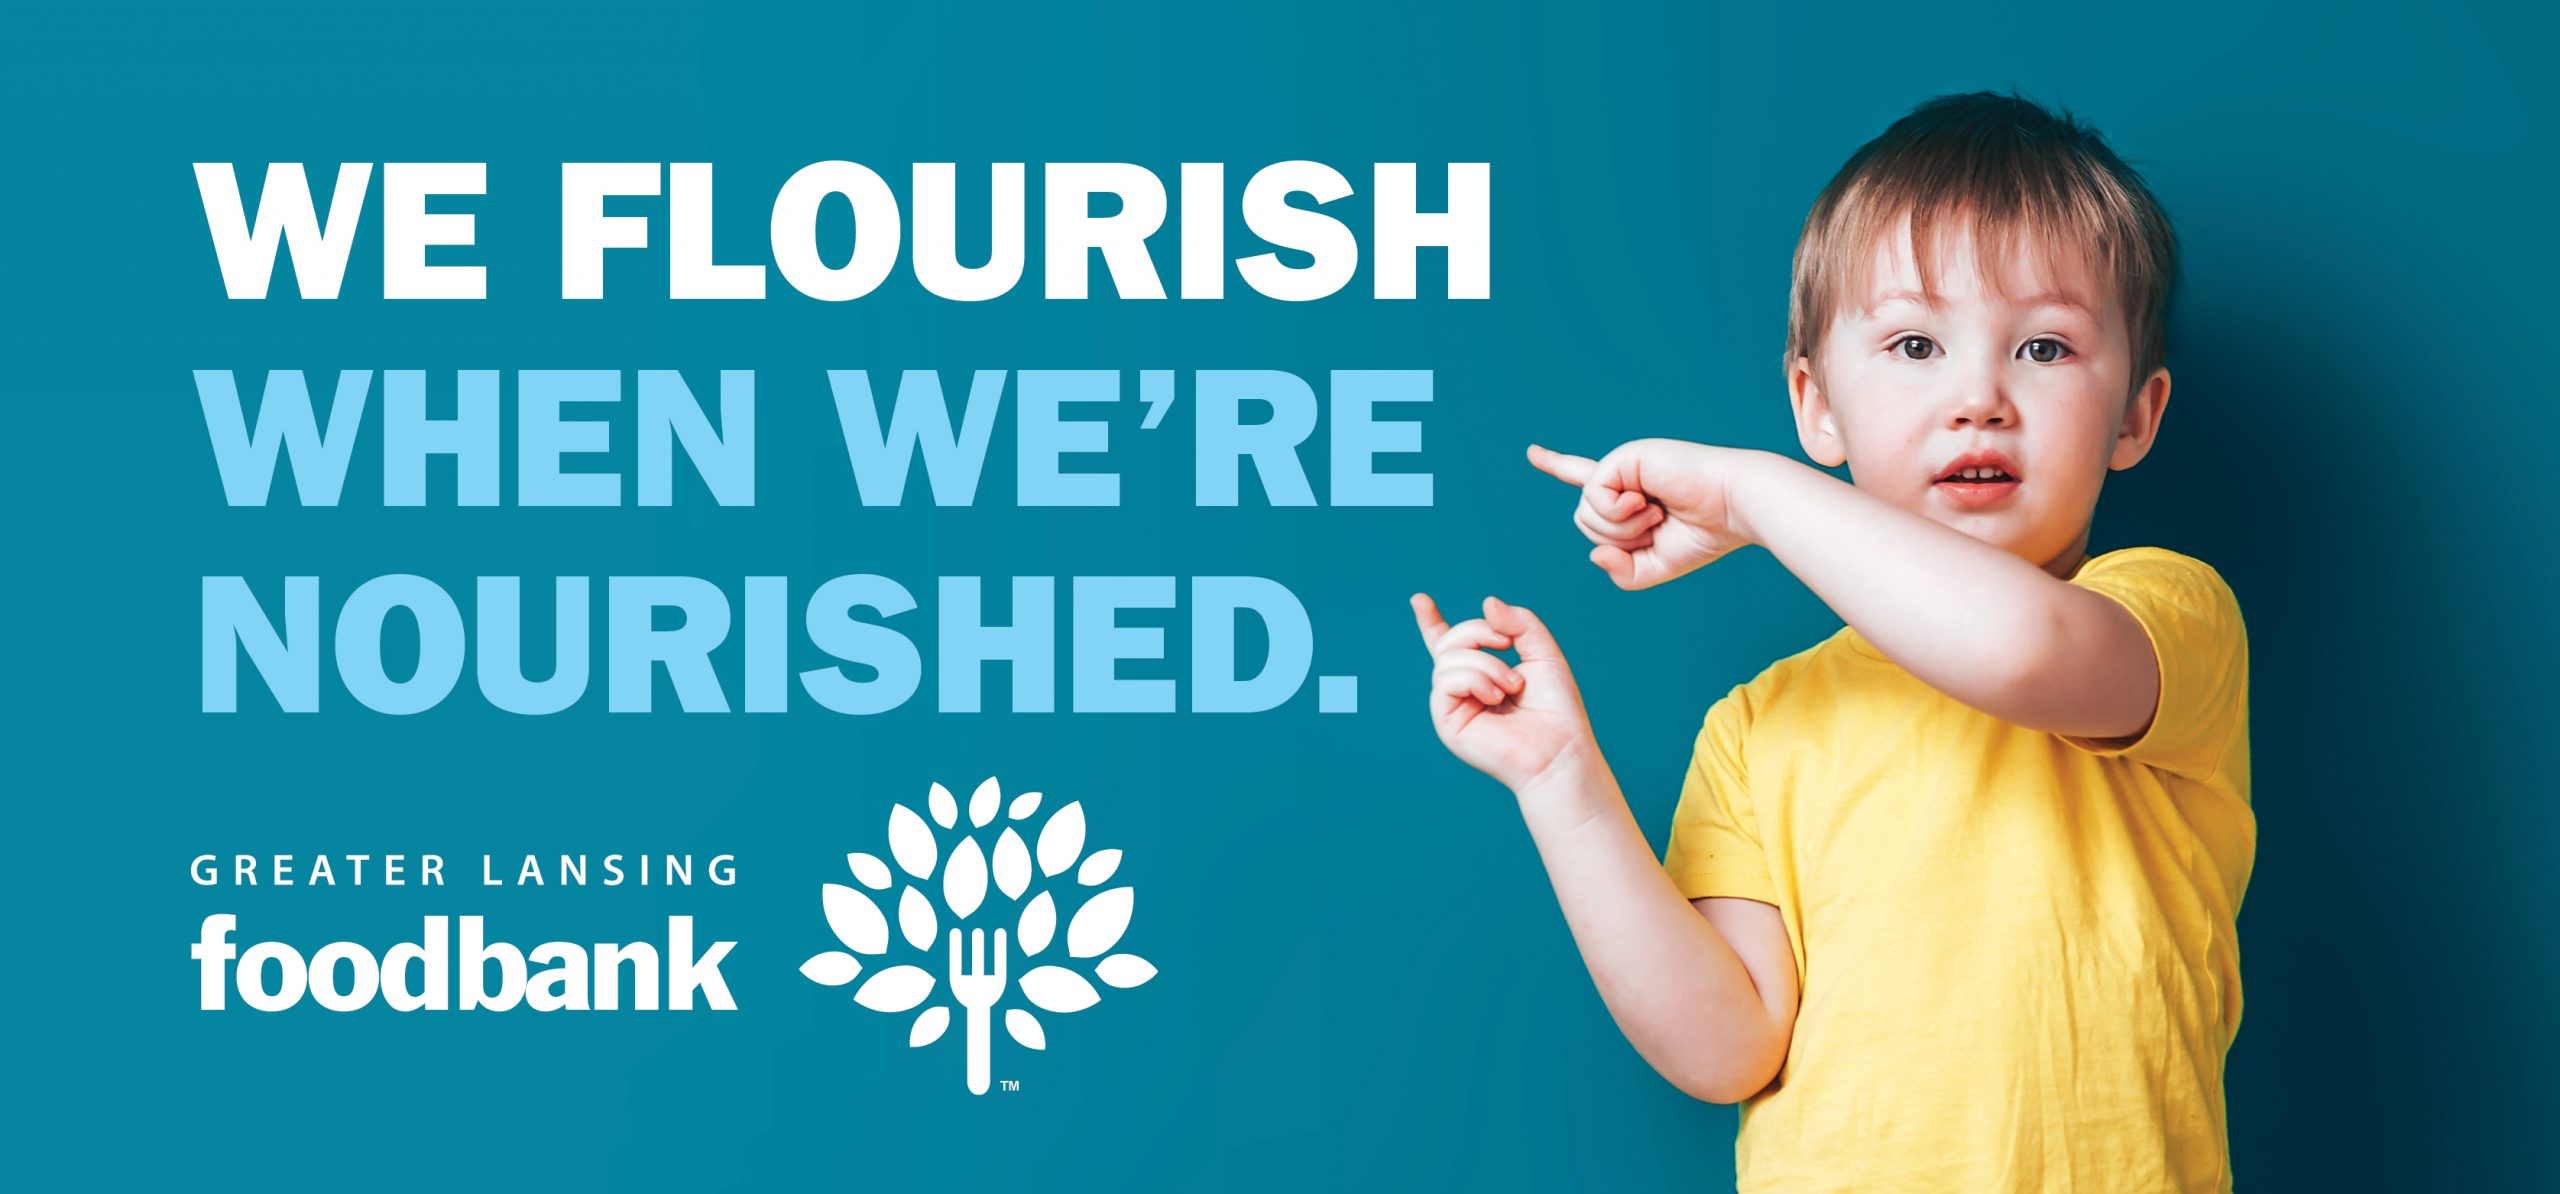 Kids Flourish When Nourished